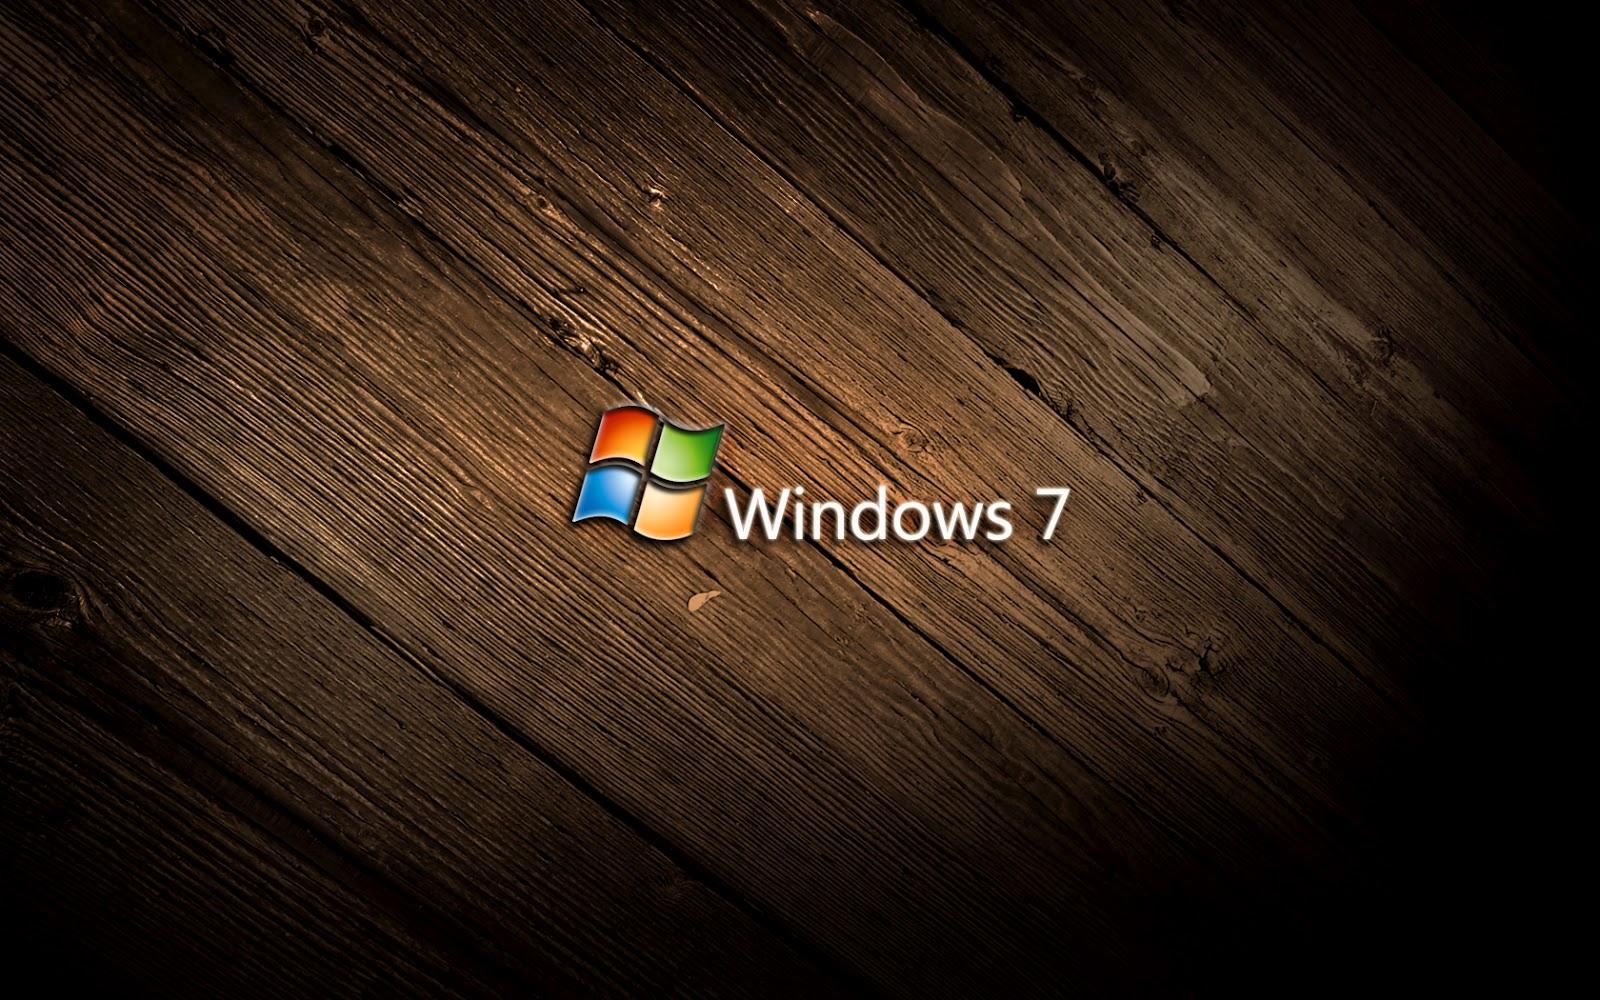 Labels Windows 7 Windows 7 HD Wallpapers Windows 7 Wallpapers 1600x1000